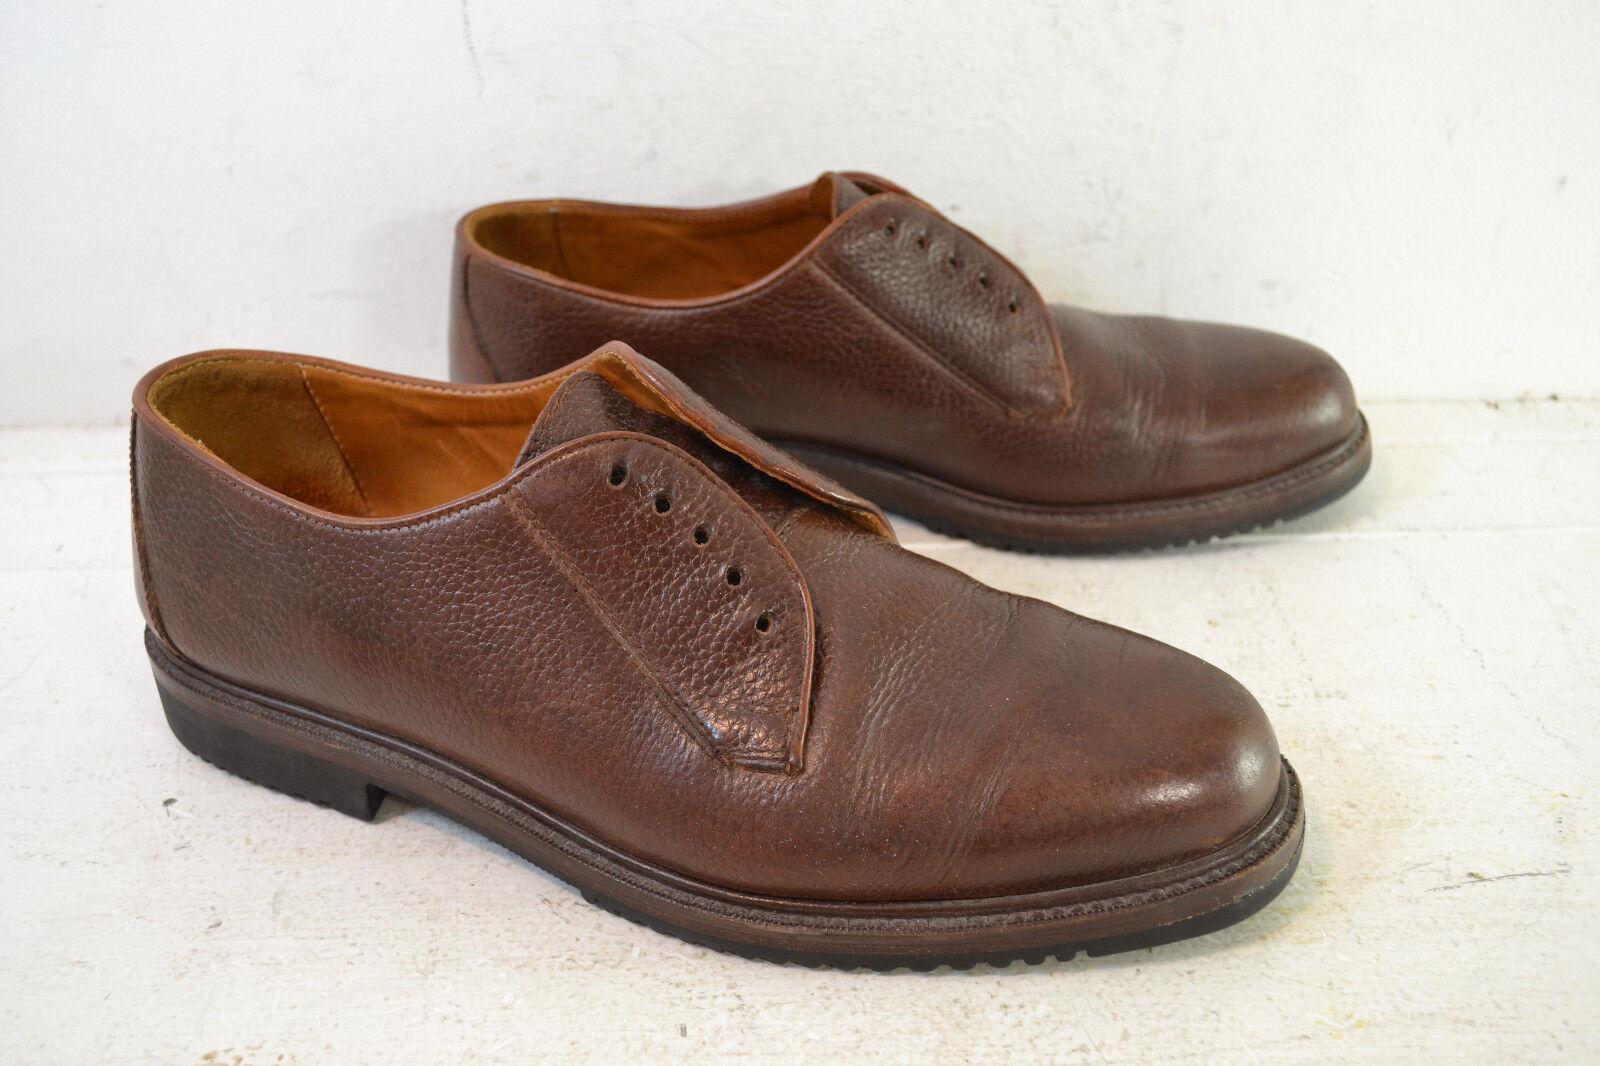 Cole Haan Pebbled Dark Brown Casual Blucher / Derby Shoes, Mn's 10.5 M